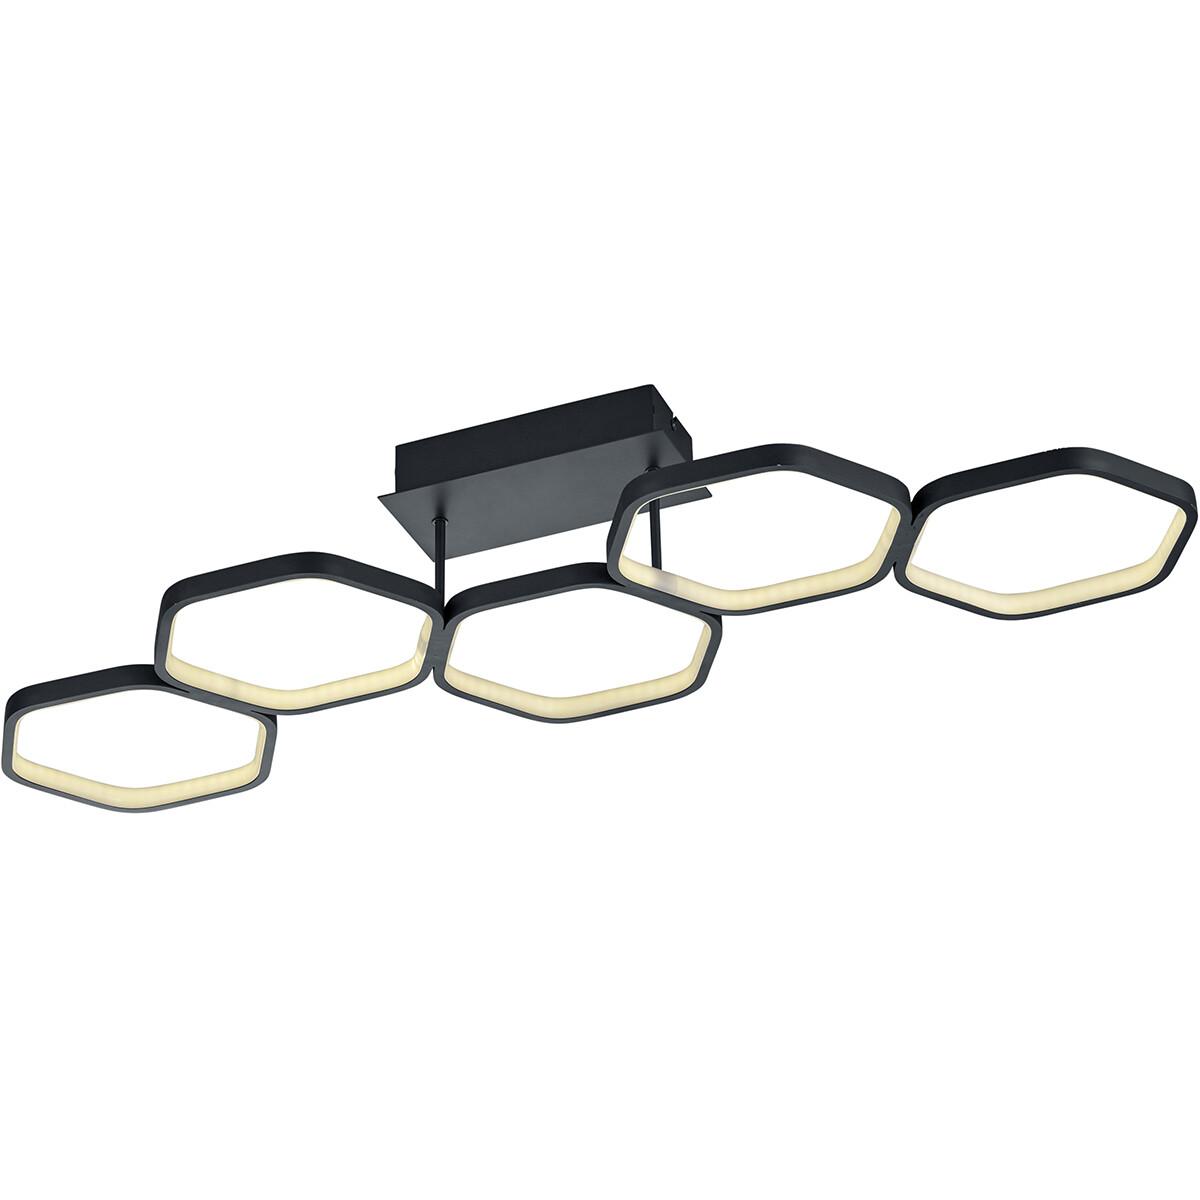 LED Plafondlamp - Trion Vigon - 24W - Warm Wit 3000K - Dimbaar - Rechthoek - Mat Zwart - Aluminium